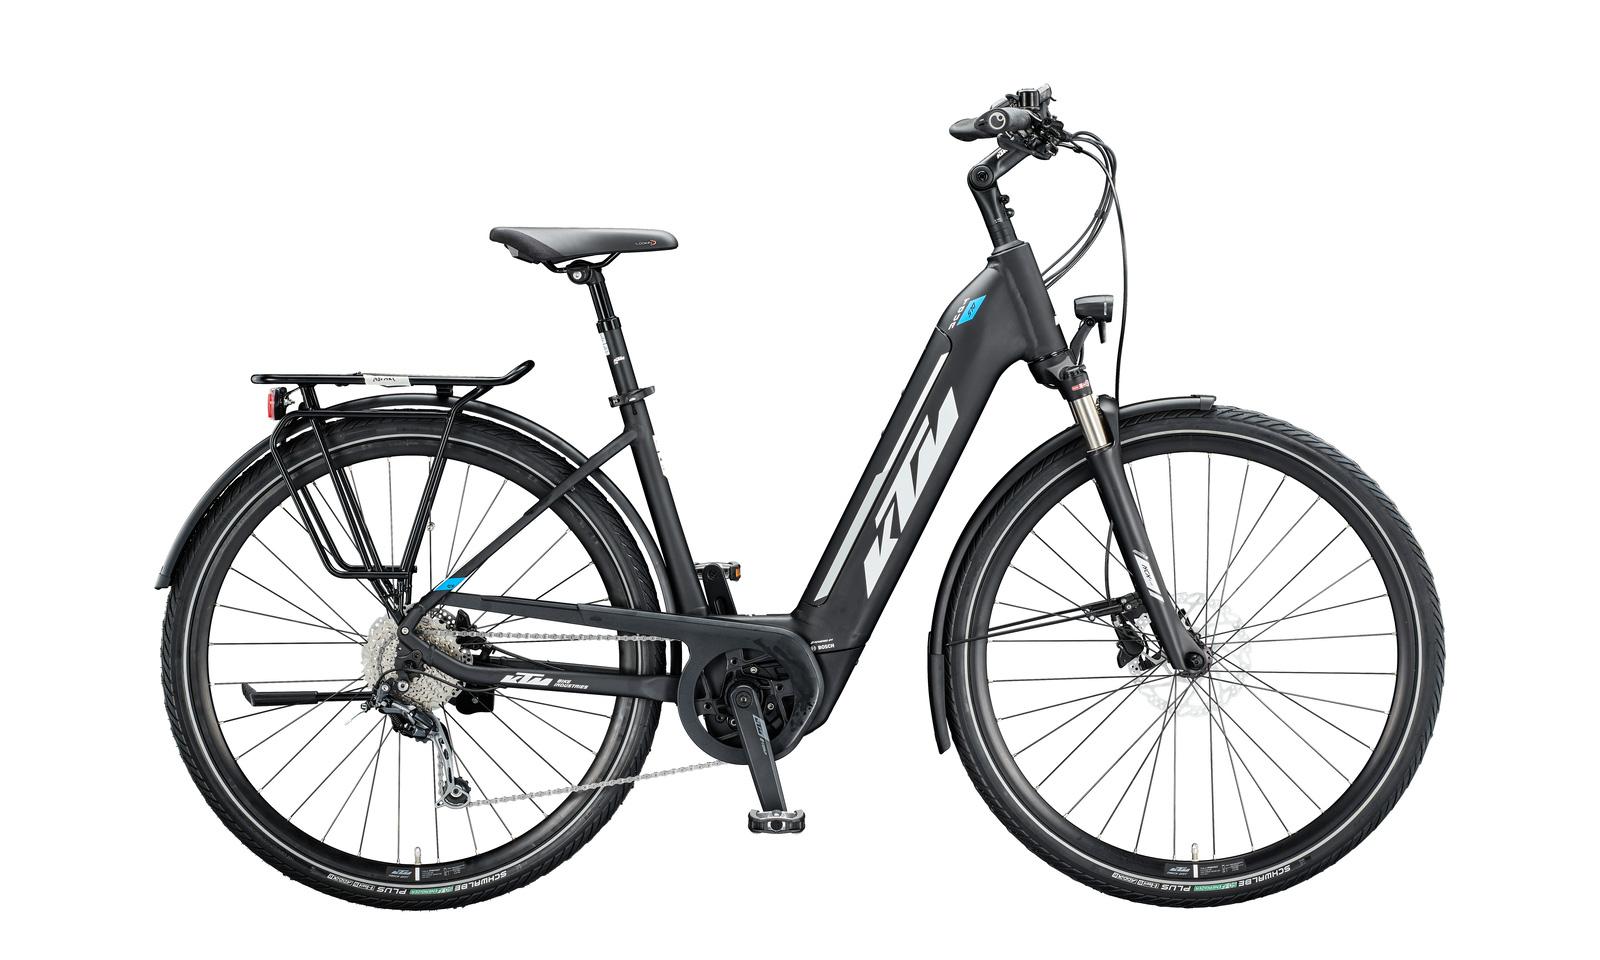 Biciclete electrice KTM E-Onroad MACINA TOUR 510 1x9 Shimano Deore